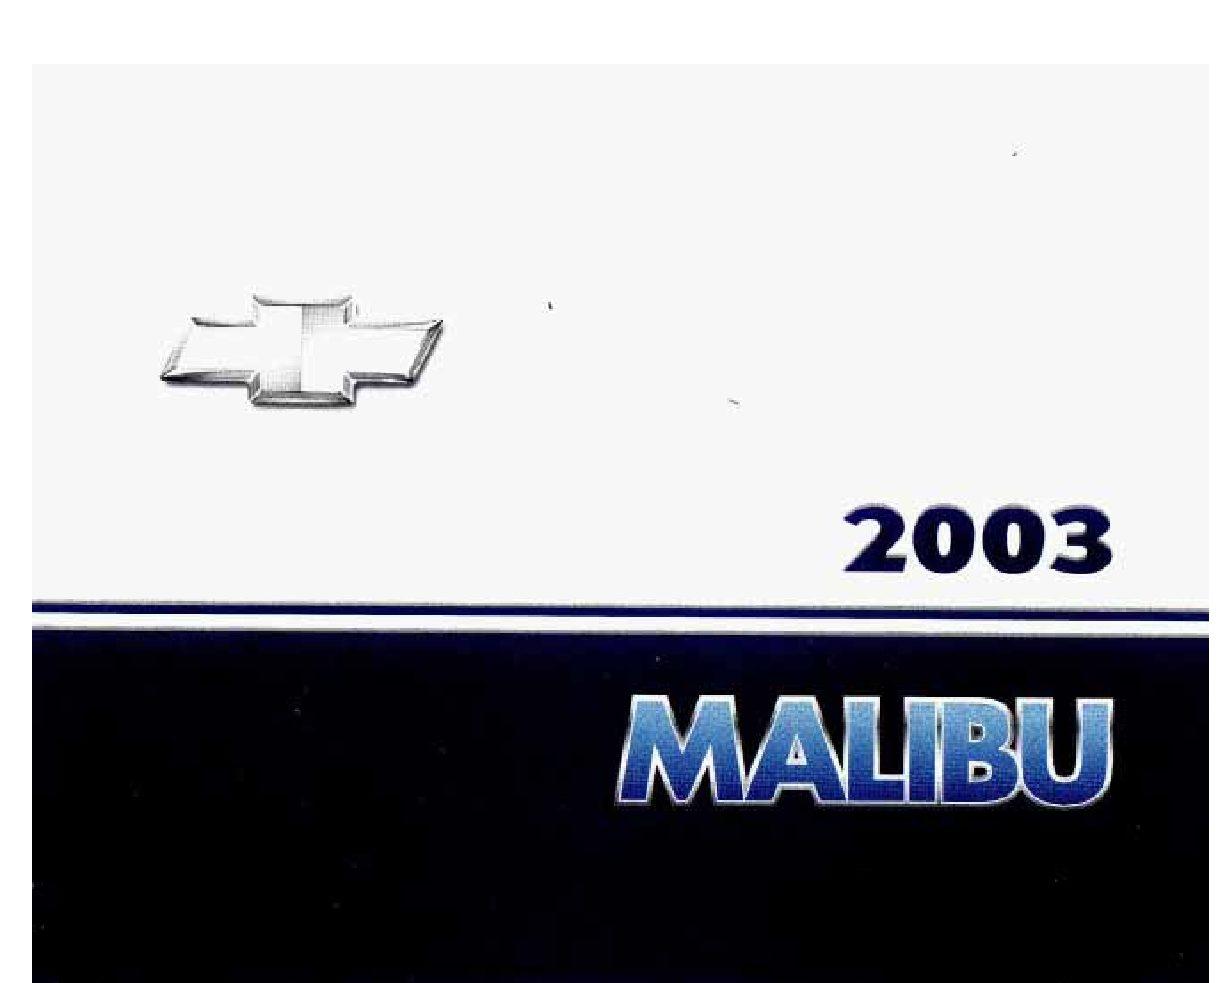 2003 chevrolet malibu owners manual just give me the damn manual rh justgivemethedamnmanual com 2004 chevrolet malibu owners manual 2003 chevrolet malibu owners manual pdf